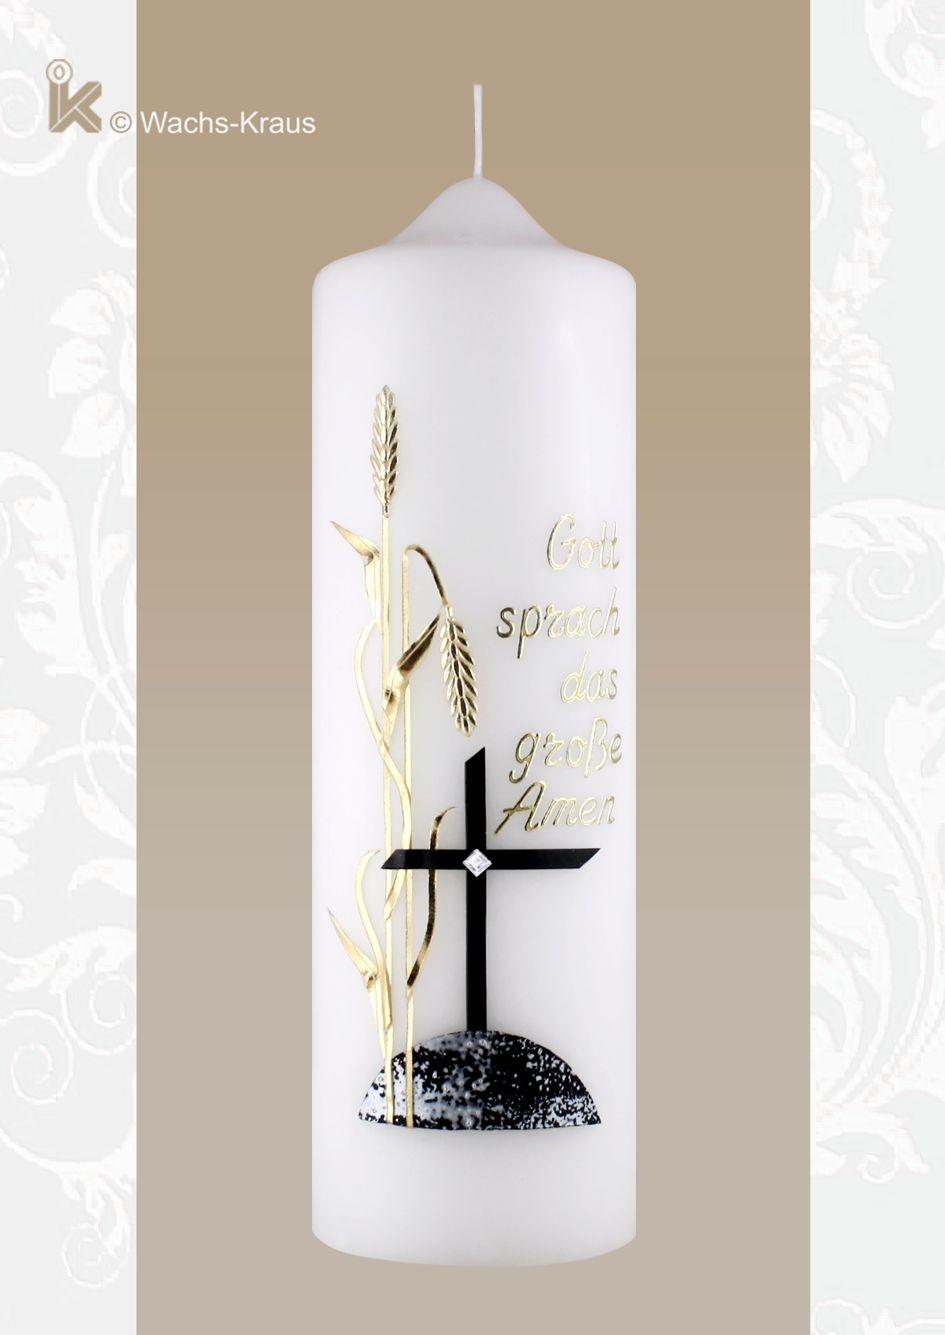 Trauerkerze schwarzes Kreuz, goldene Ähren